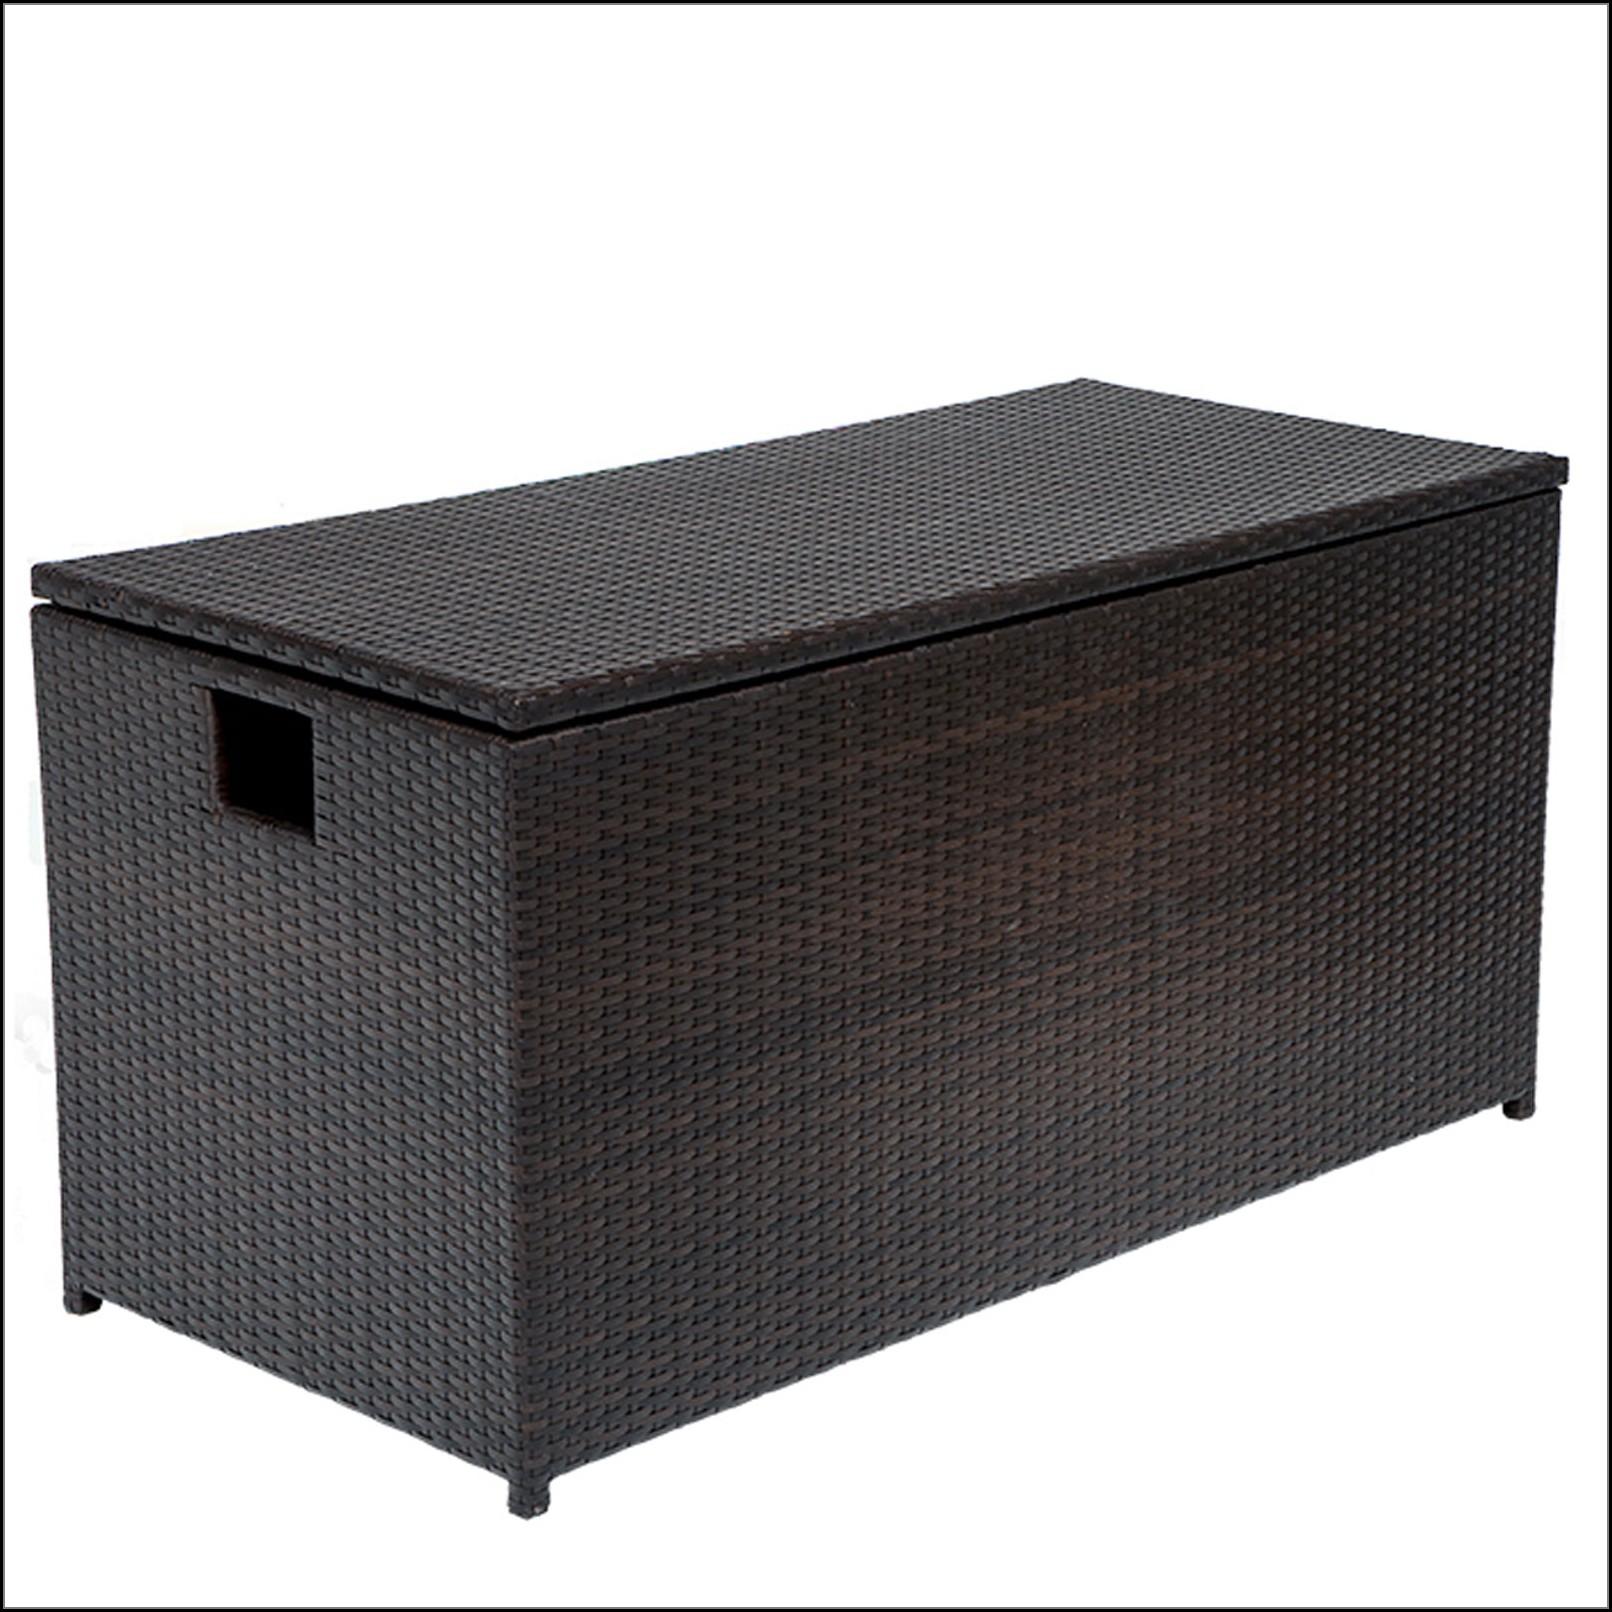 Wicker Patio Storage Chest